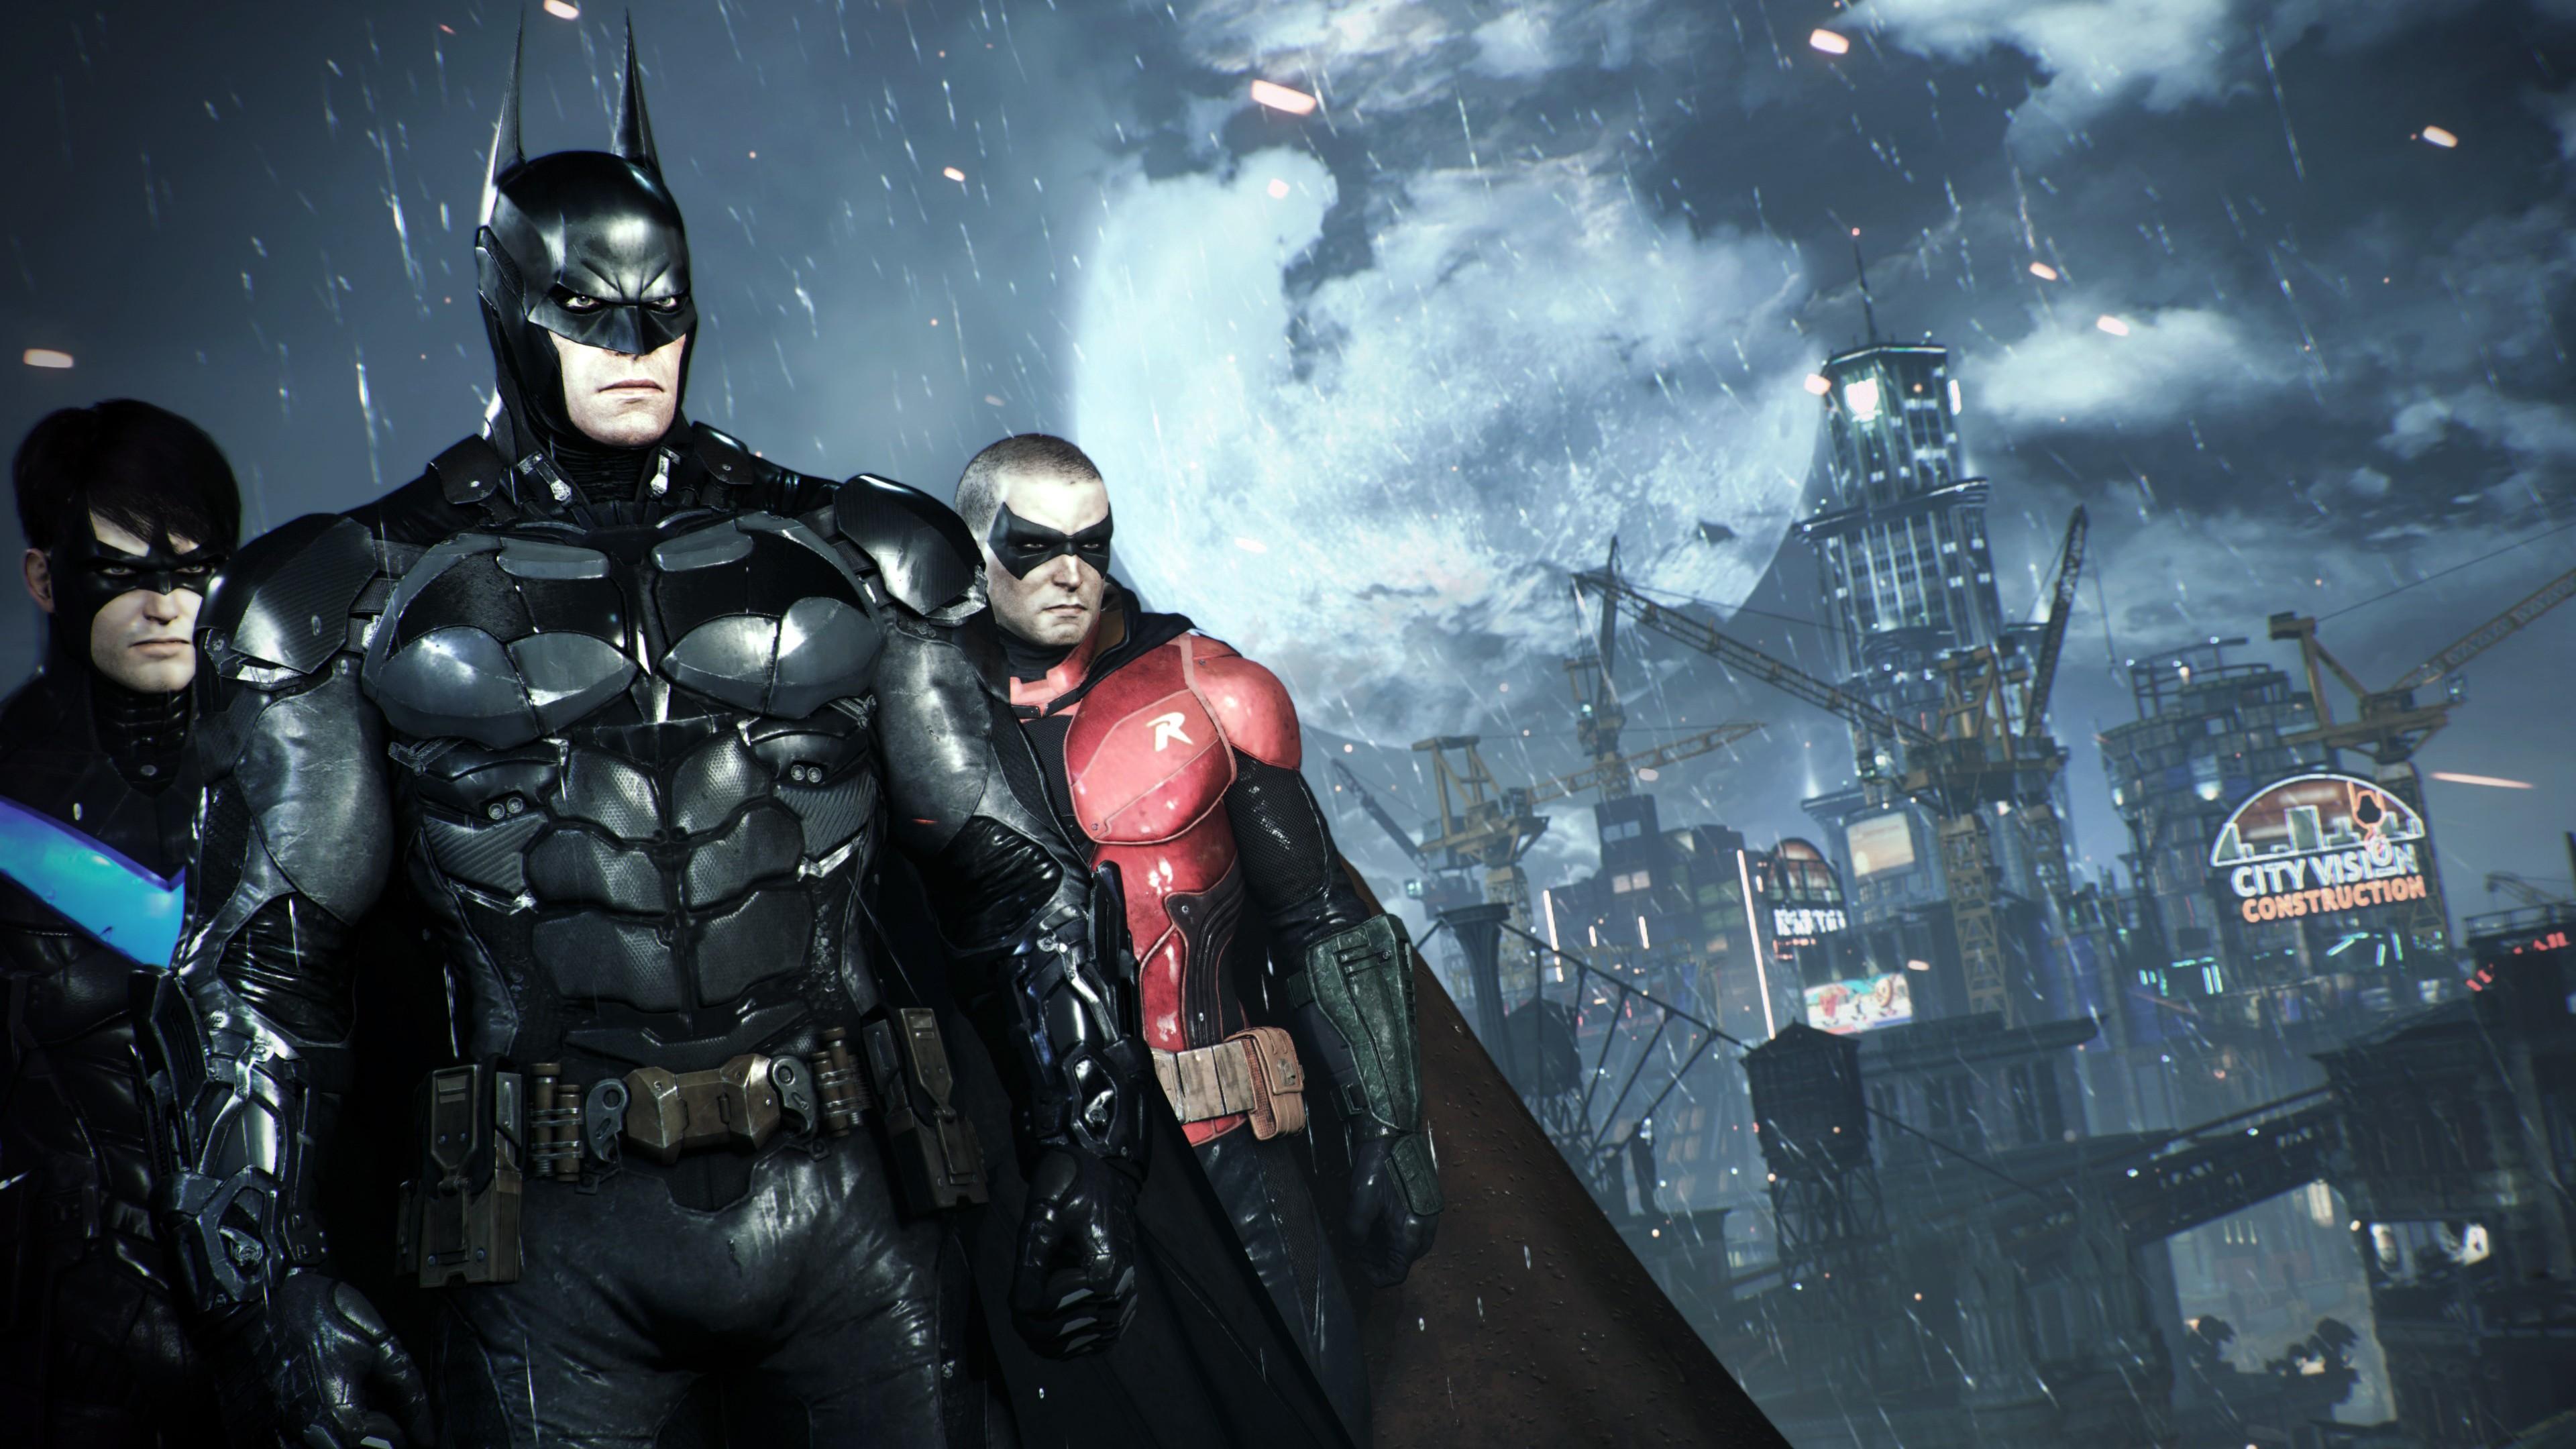 Batman Arkham Knight Wallpaper - Wickedsa com